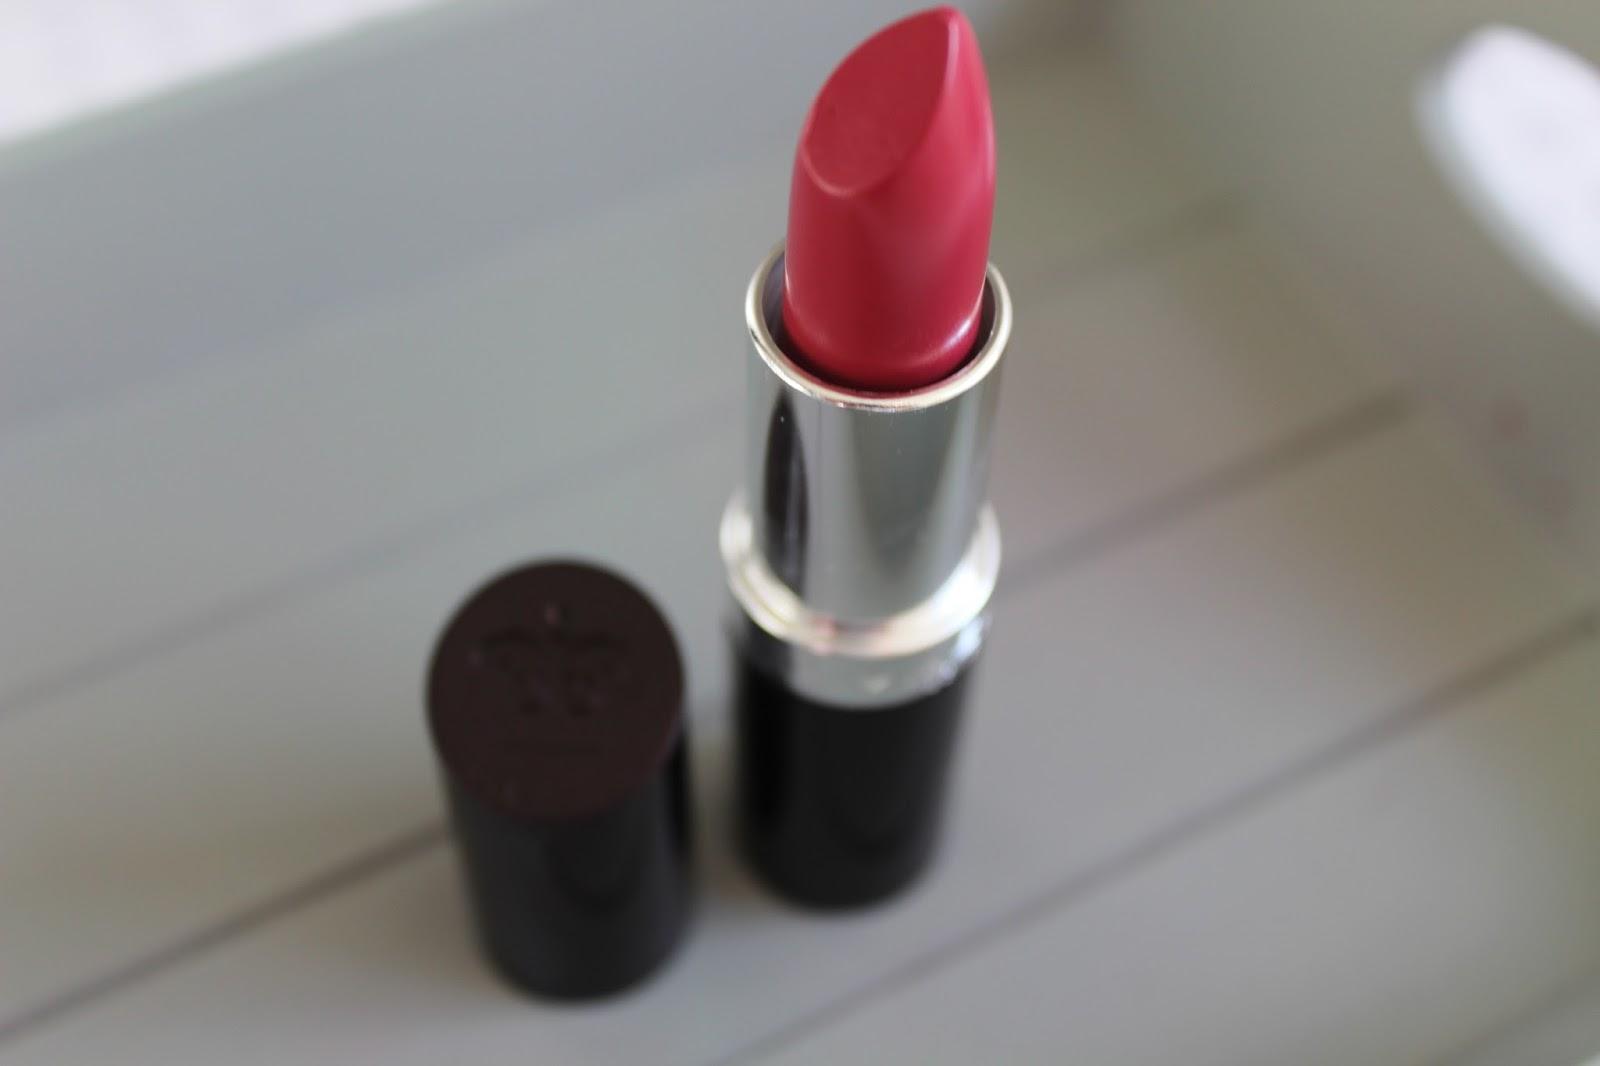 Rimmel lipstick Heart Breaker 016